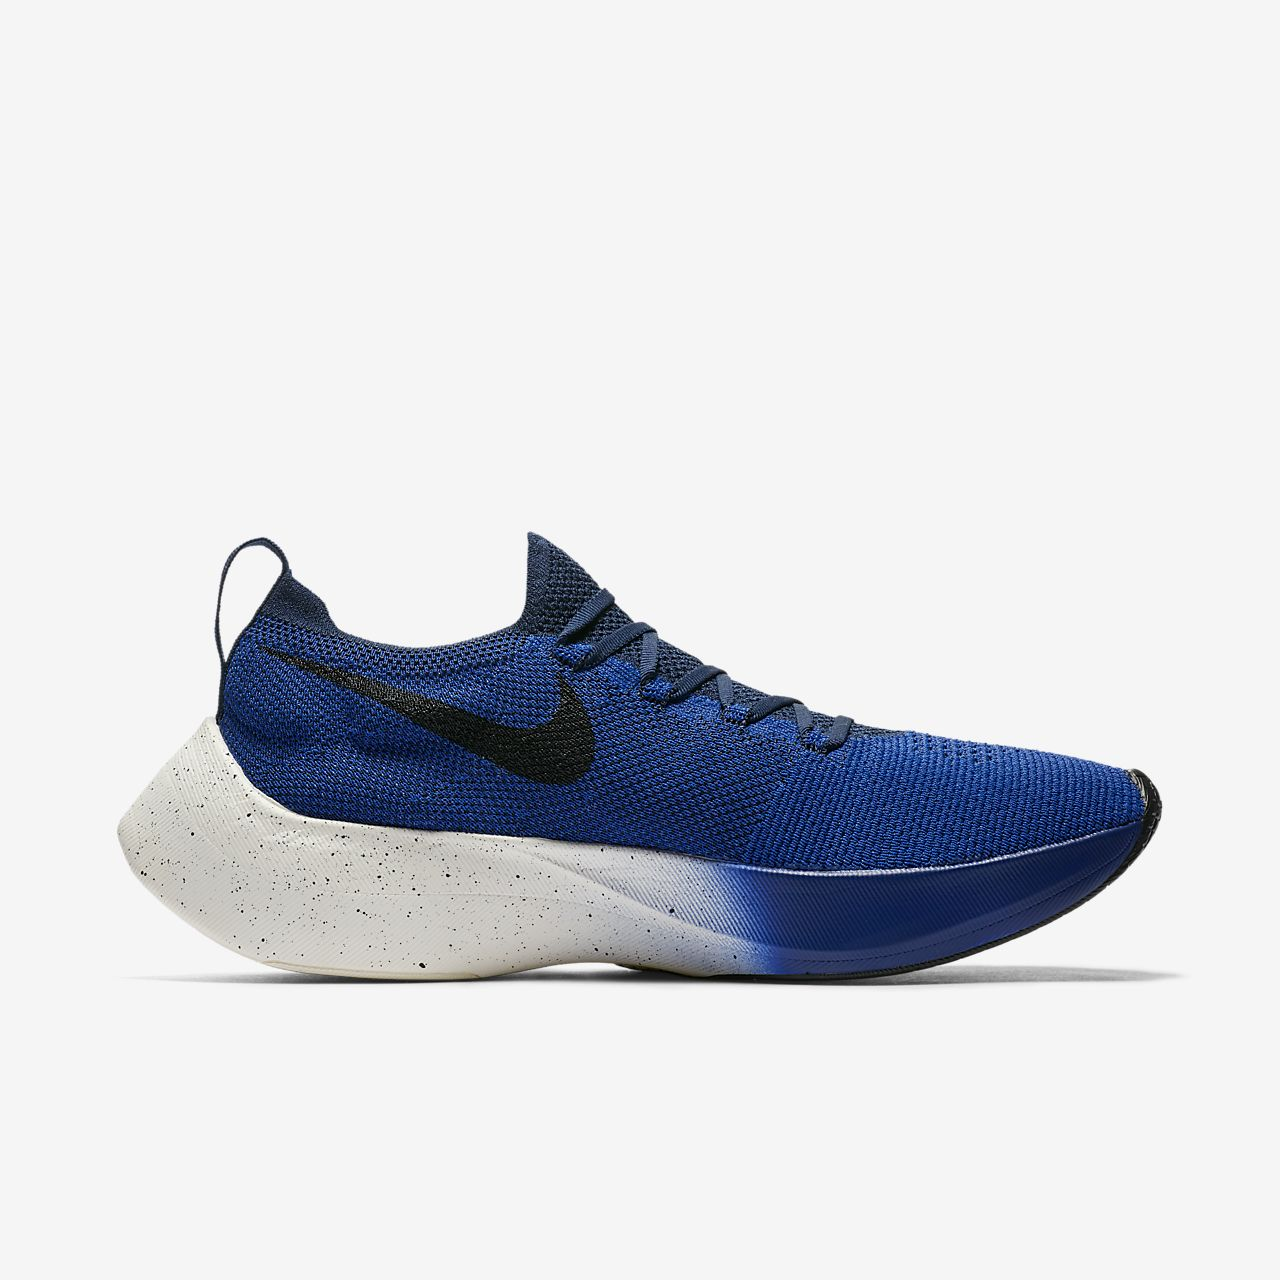 4788b86052bf Nike React Vapor Street Flyknit Men s Shoe. Nike.com ZA